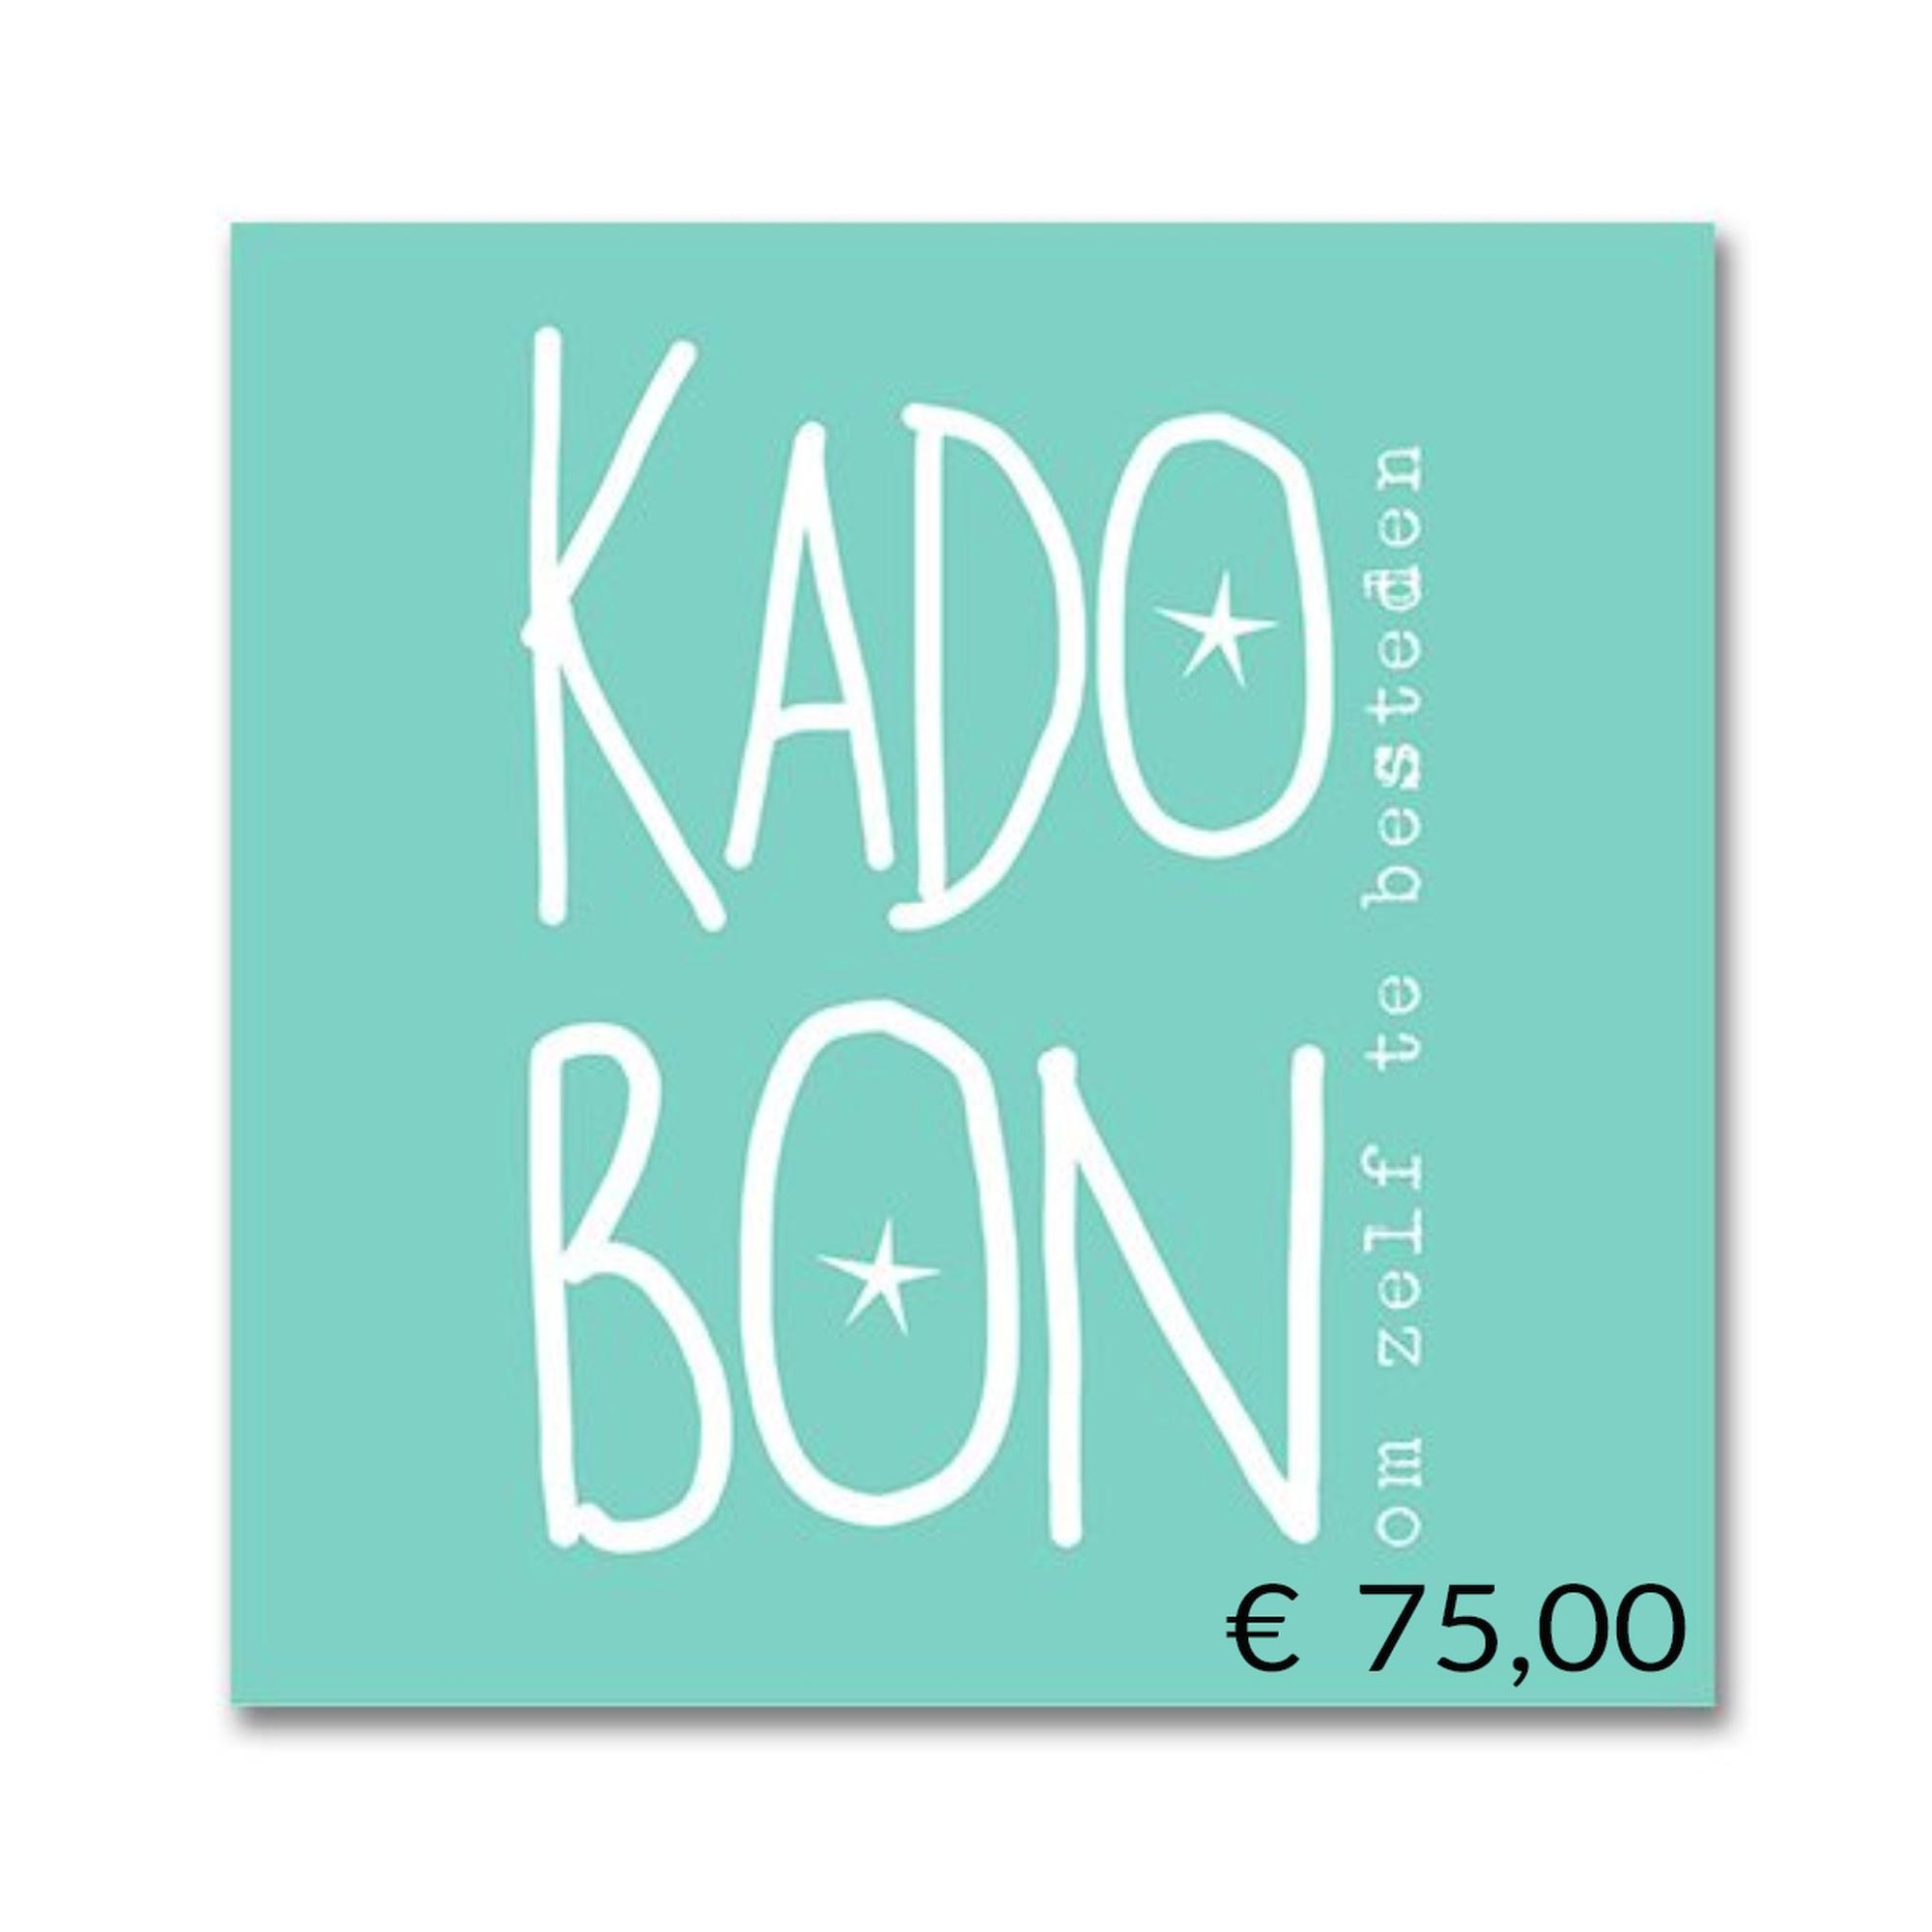 Steenwijk Schoenmode Kadobon Eur 75,00